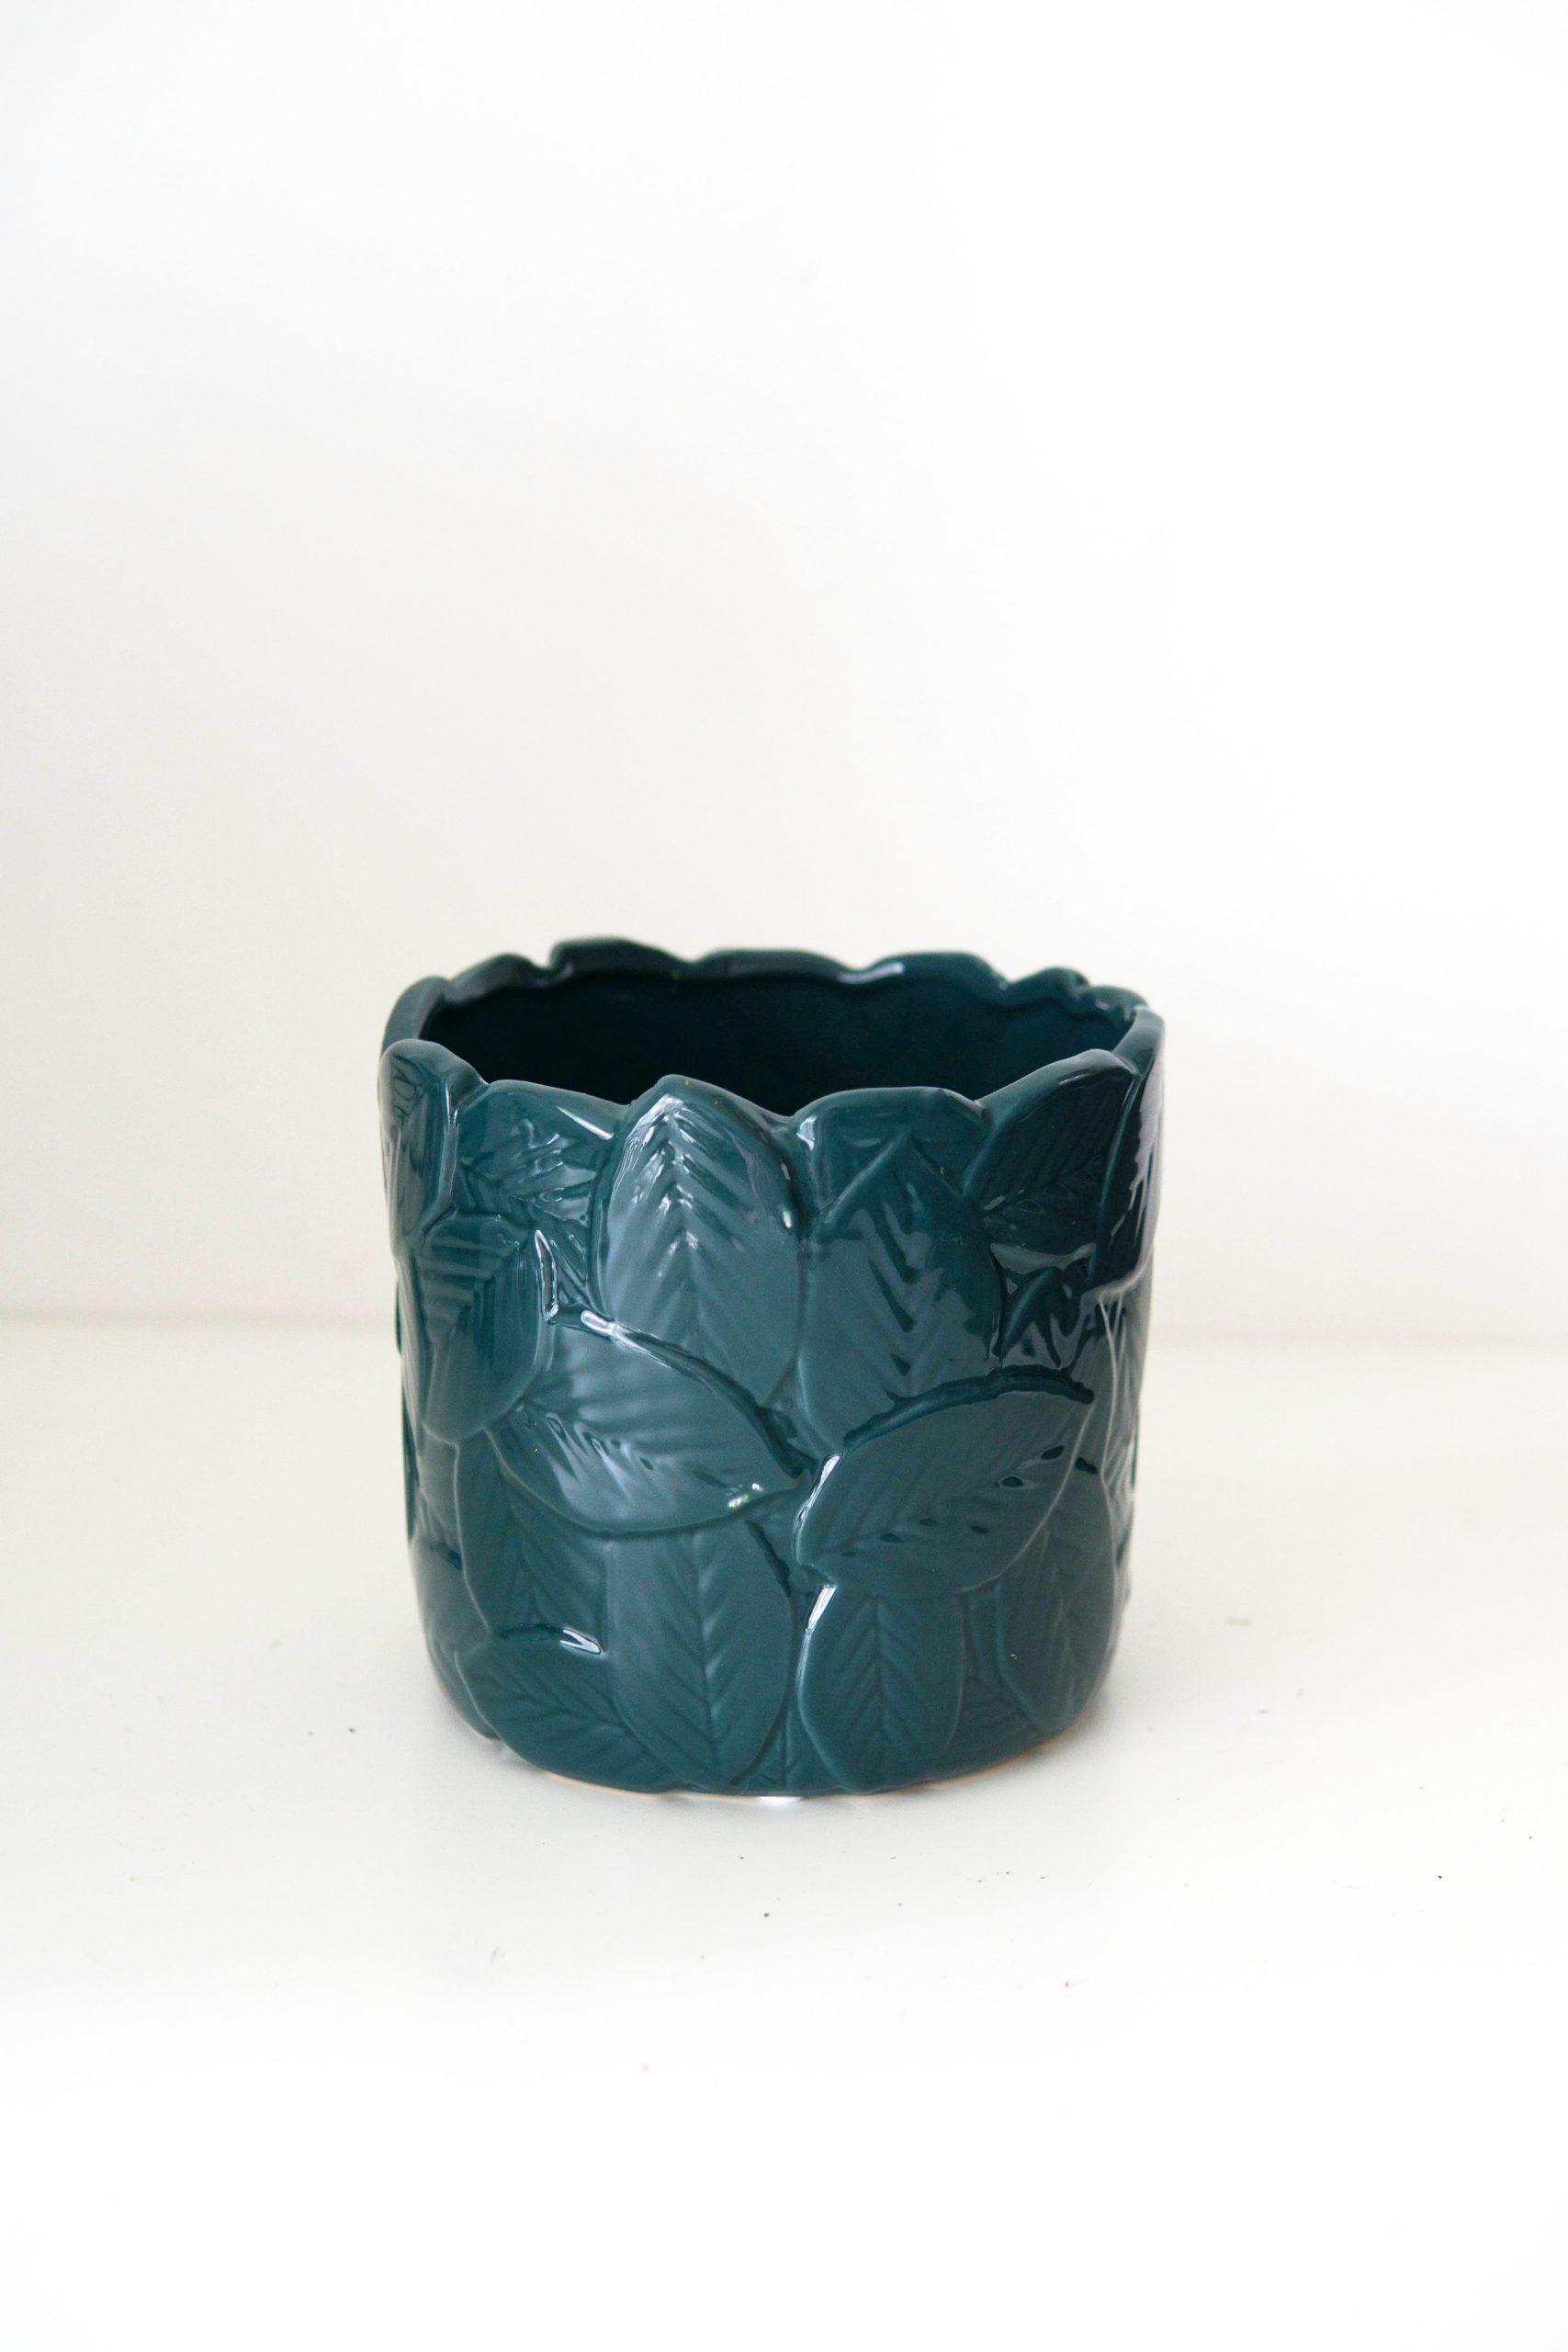 cache pot bleu leaves o 10 12 15 cm